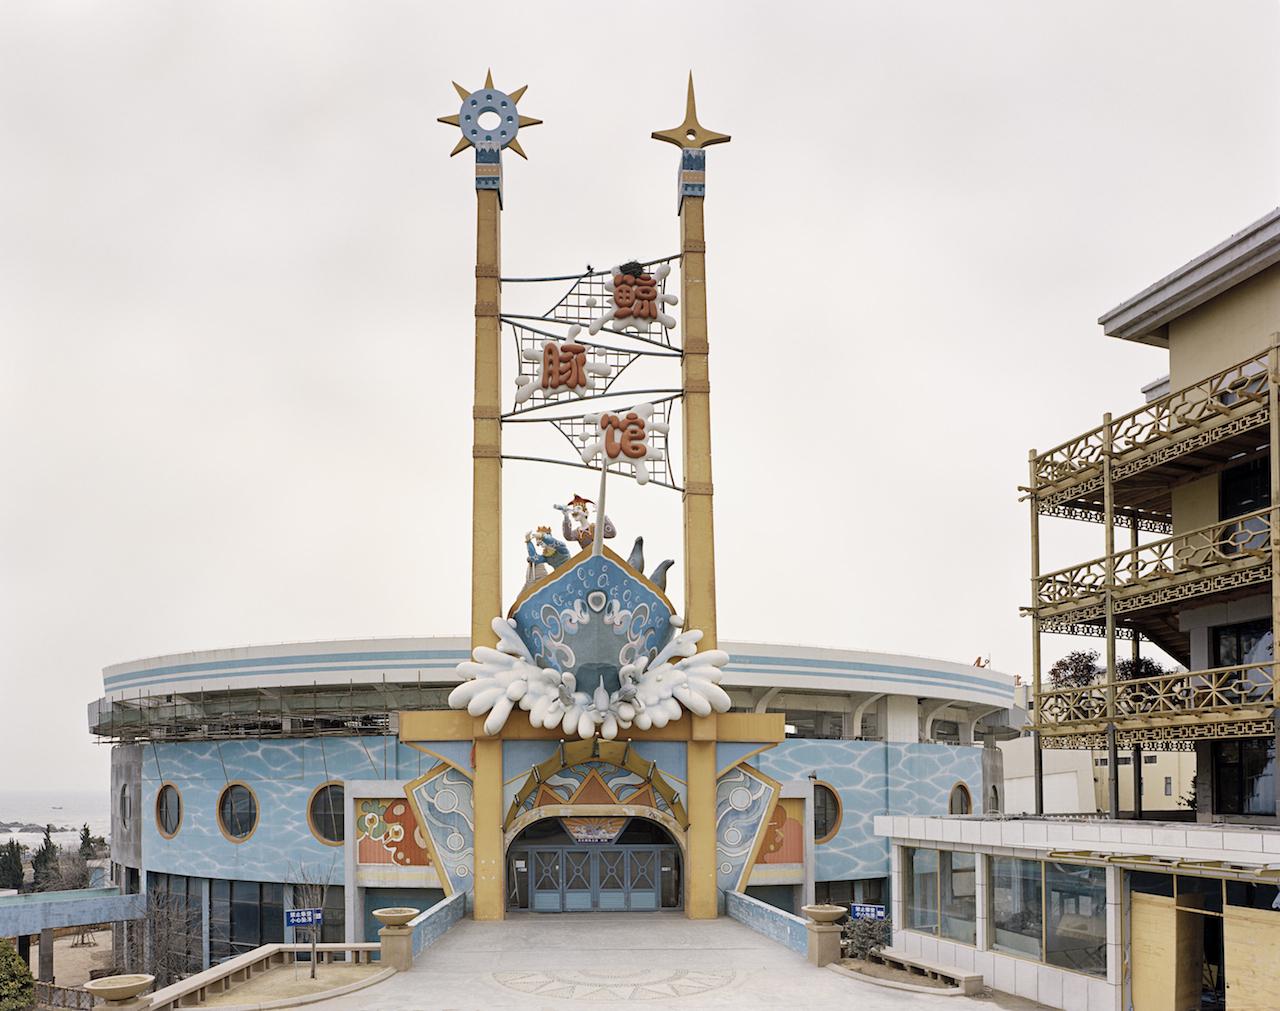 Polar Ocean Park-Qingdao in 'Stefano Cerio: Chinese Fun'